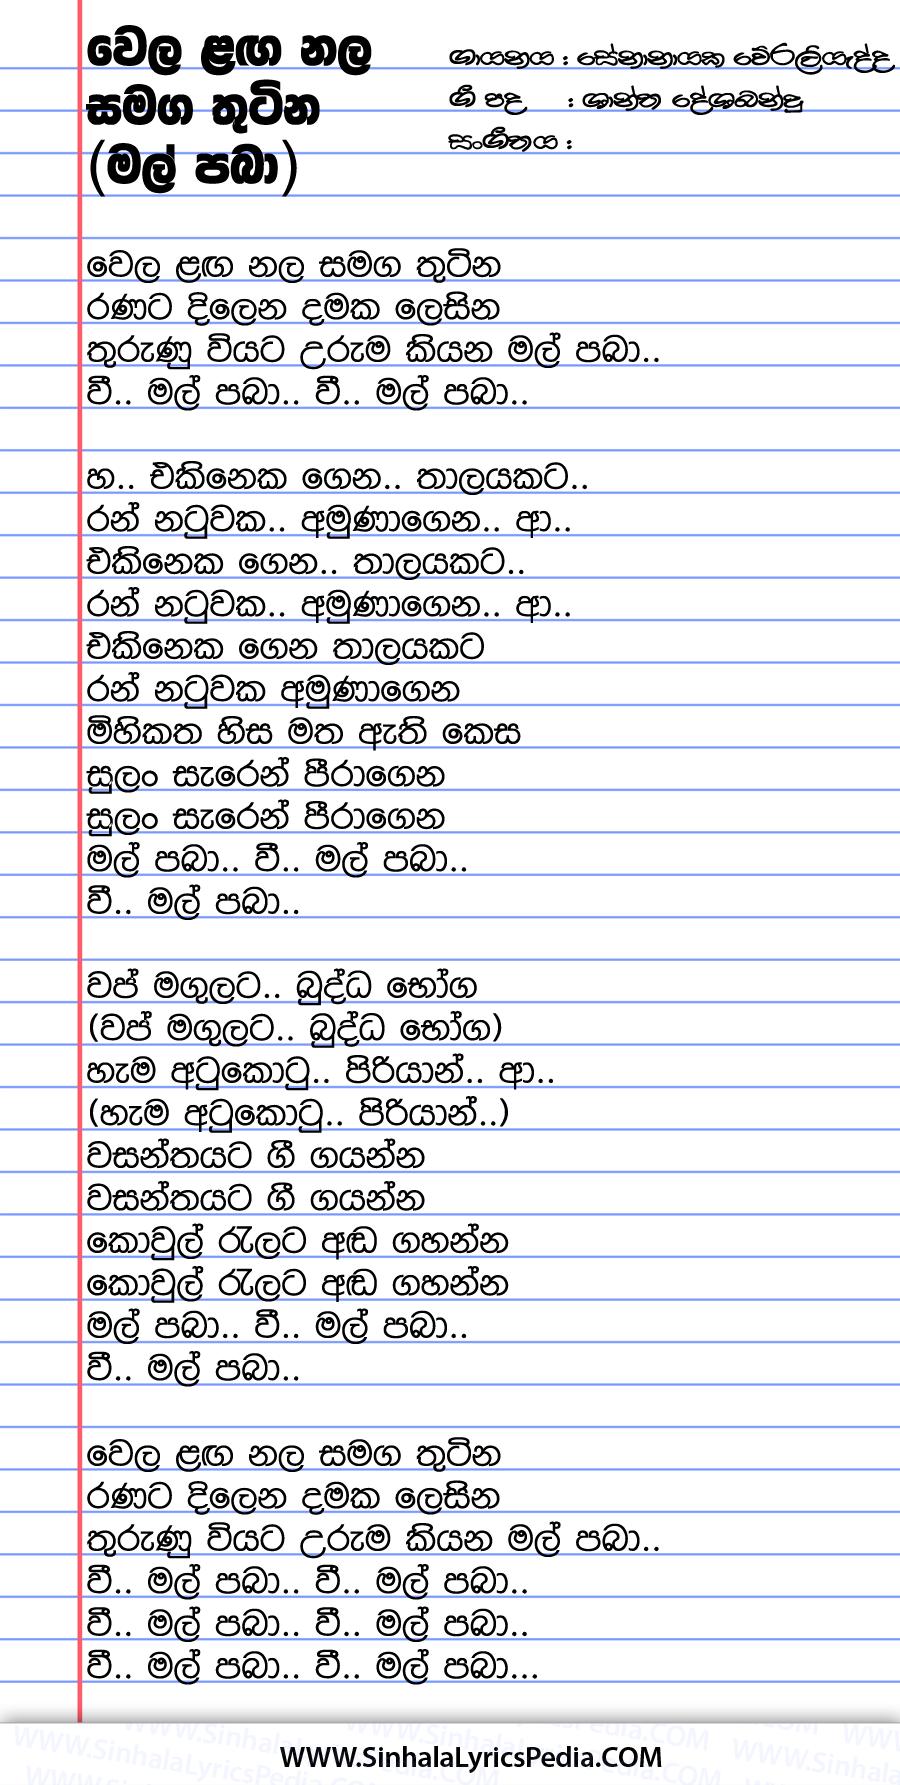 Wela Laga Nala Samaga Thutina (Mal Paba) Song Lyrics